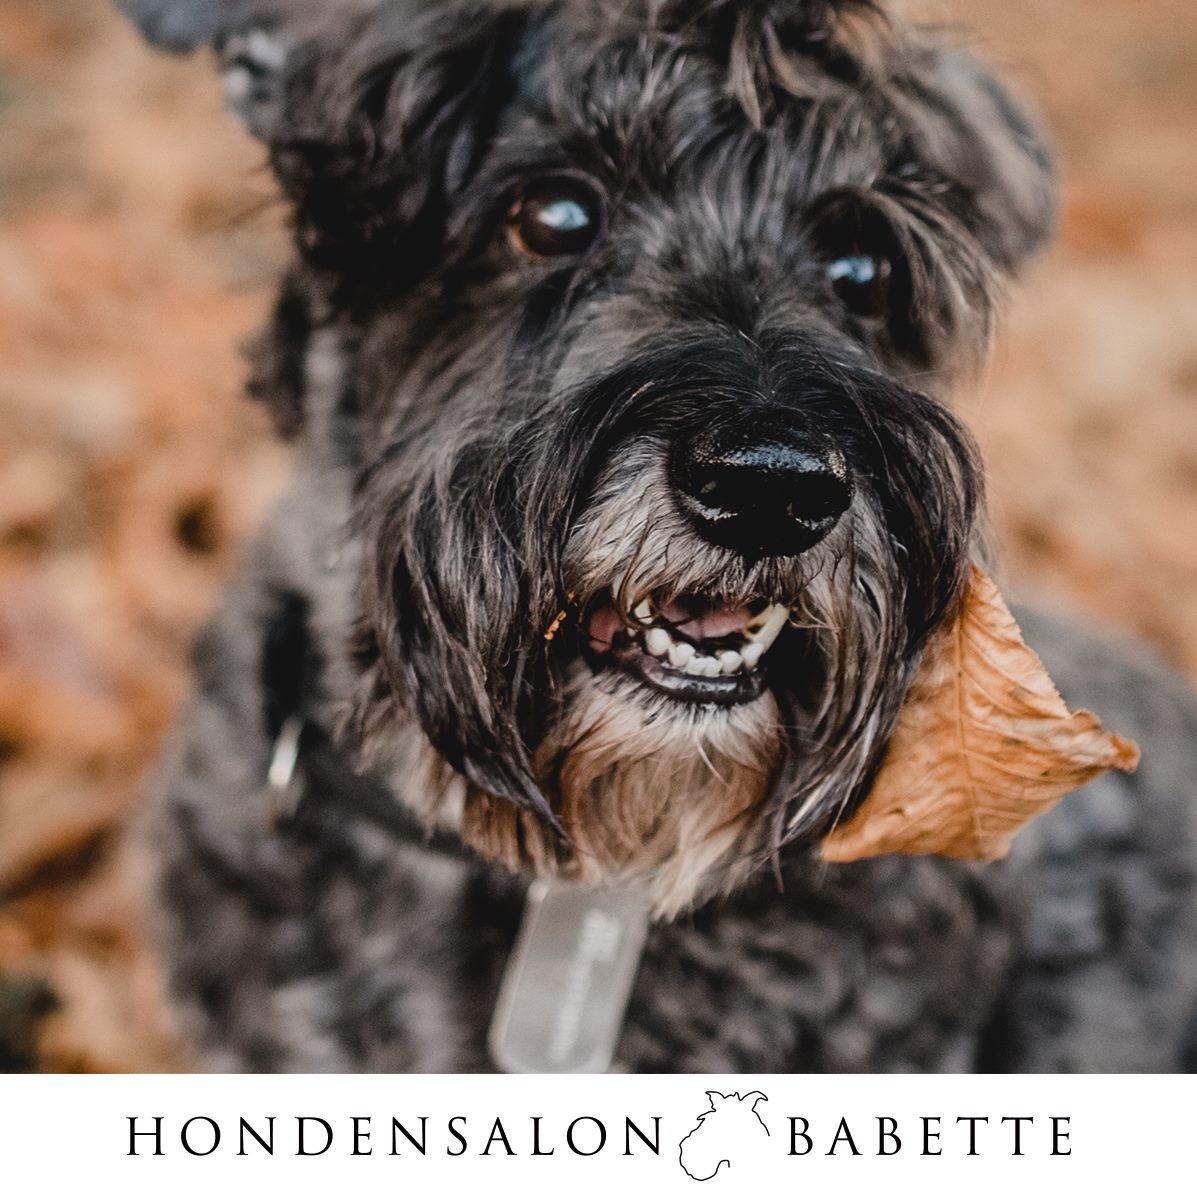 Hondensalon Babette